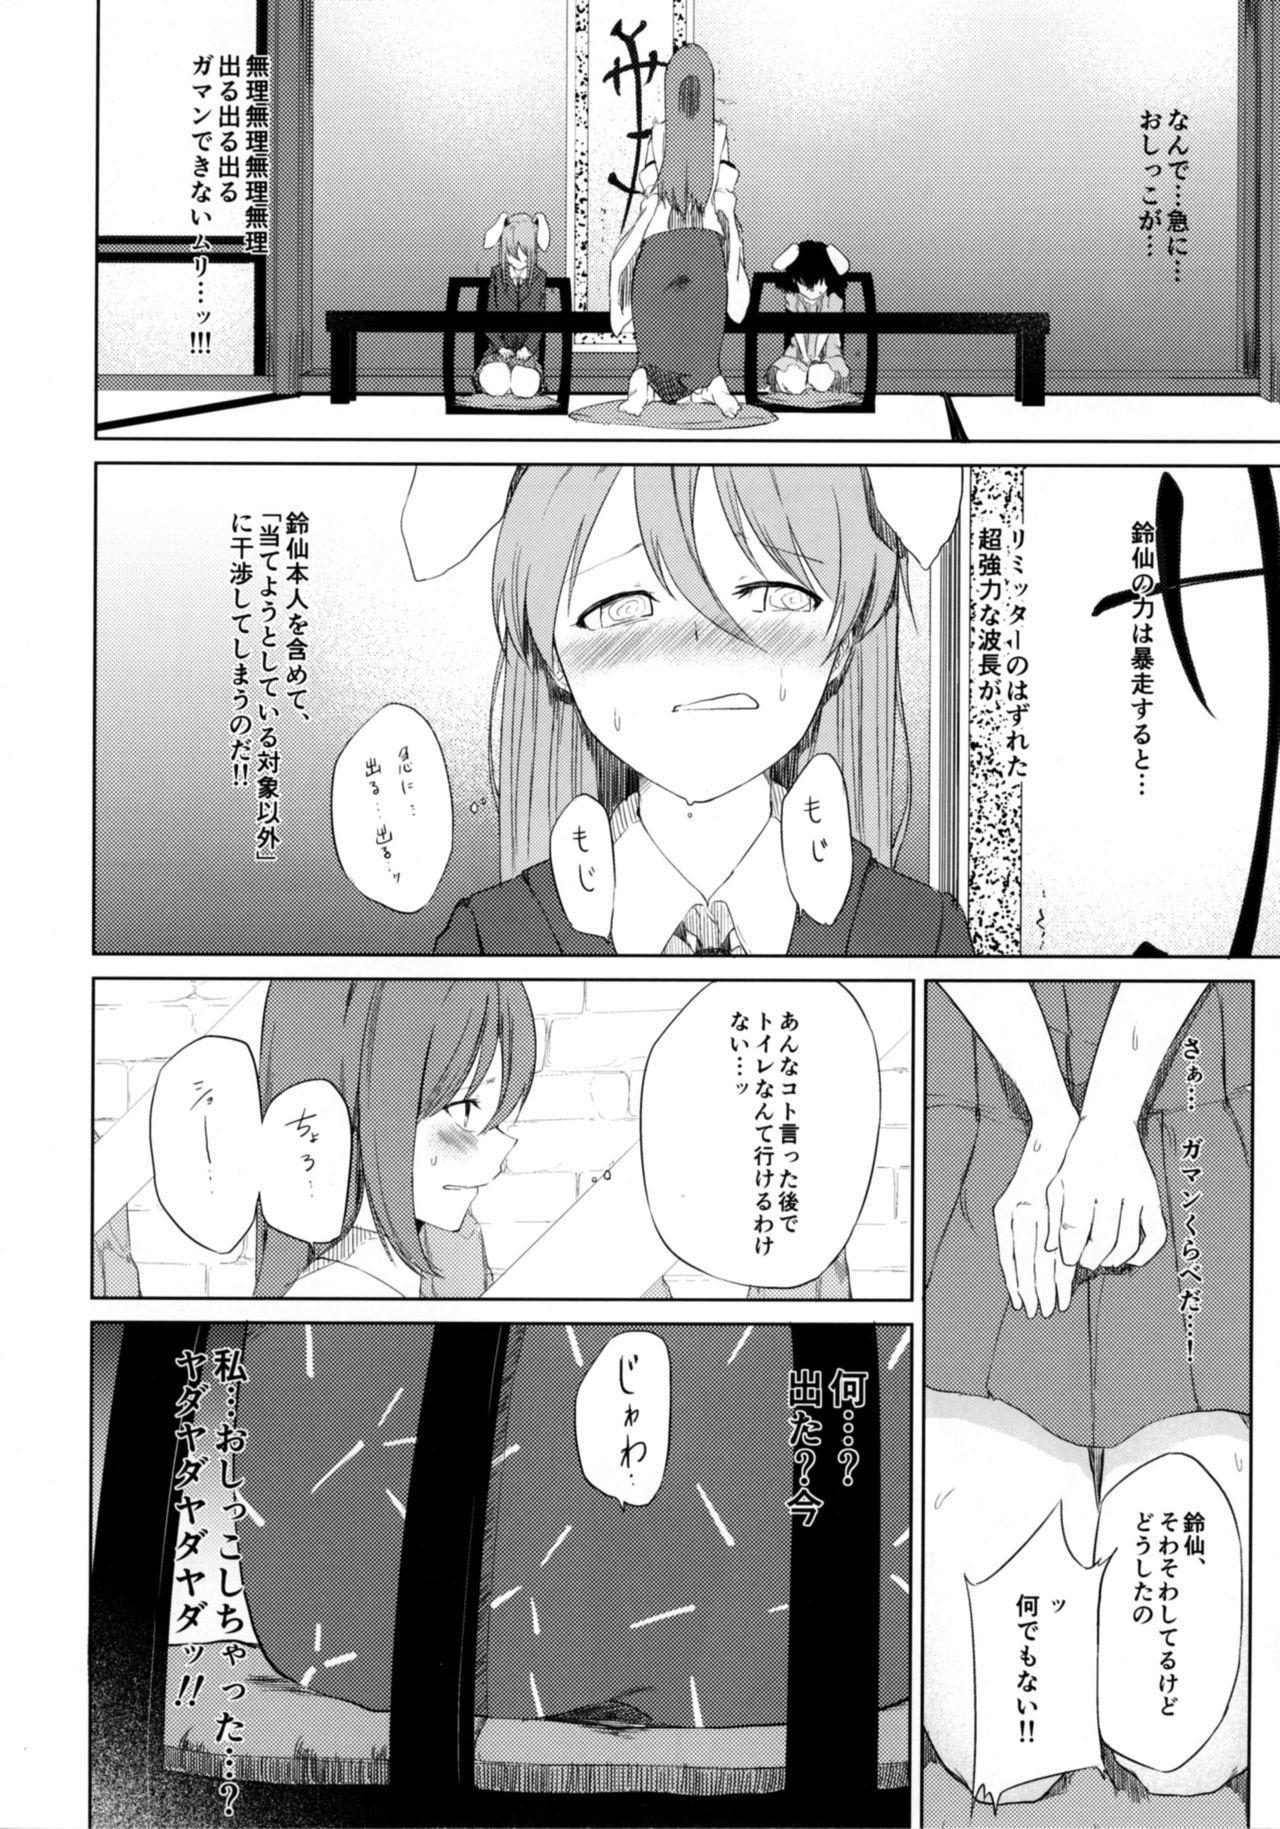 Aya to Tewi to Sanae to Udonge ga Omorashi Suru Hon!! 17